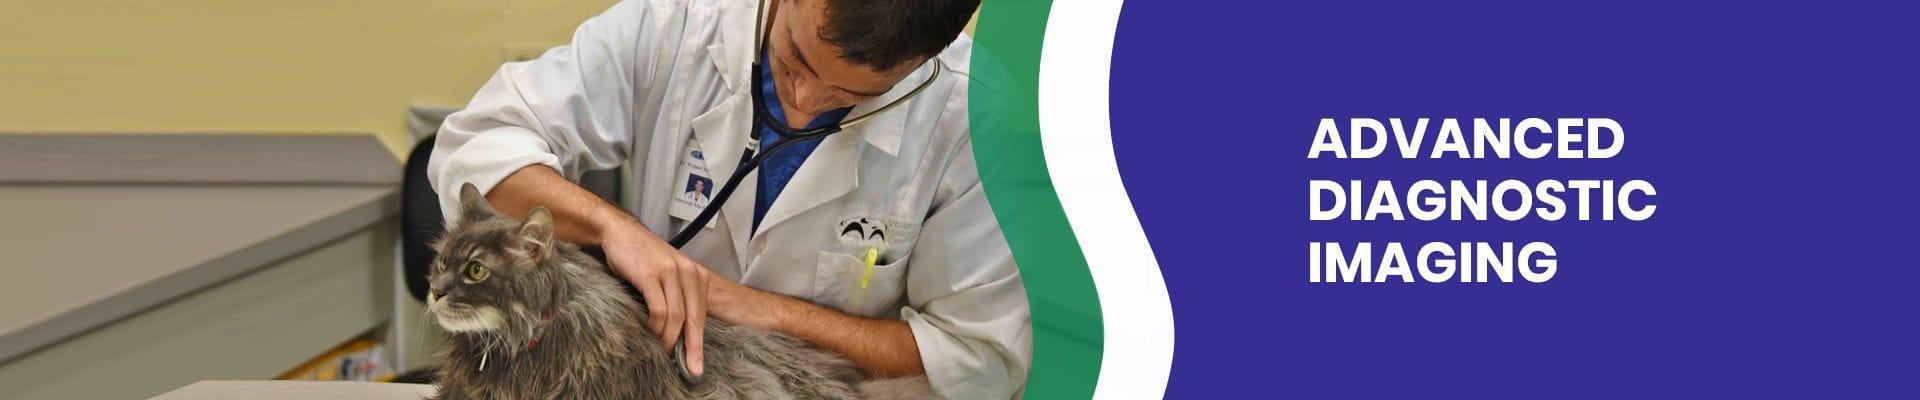 Advanced Diagnostic Imaging | Veterinary Specialist Services